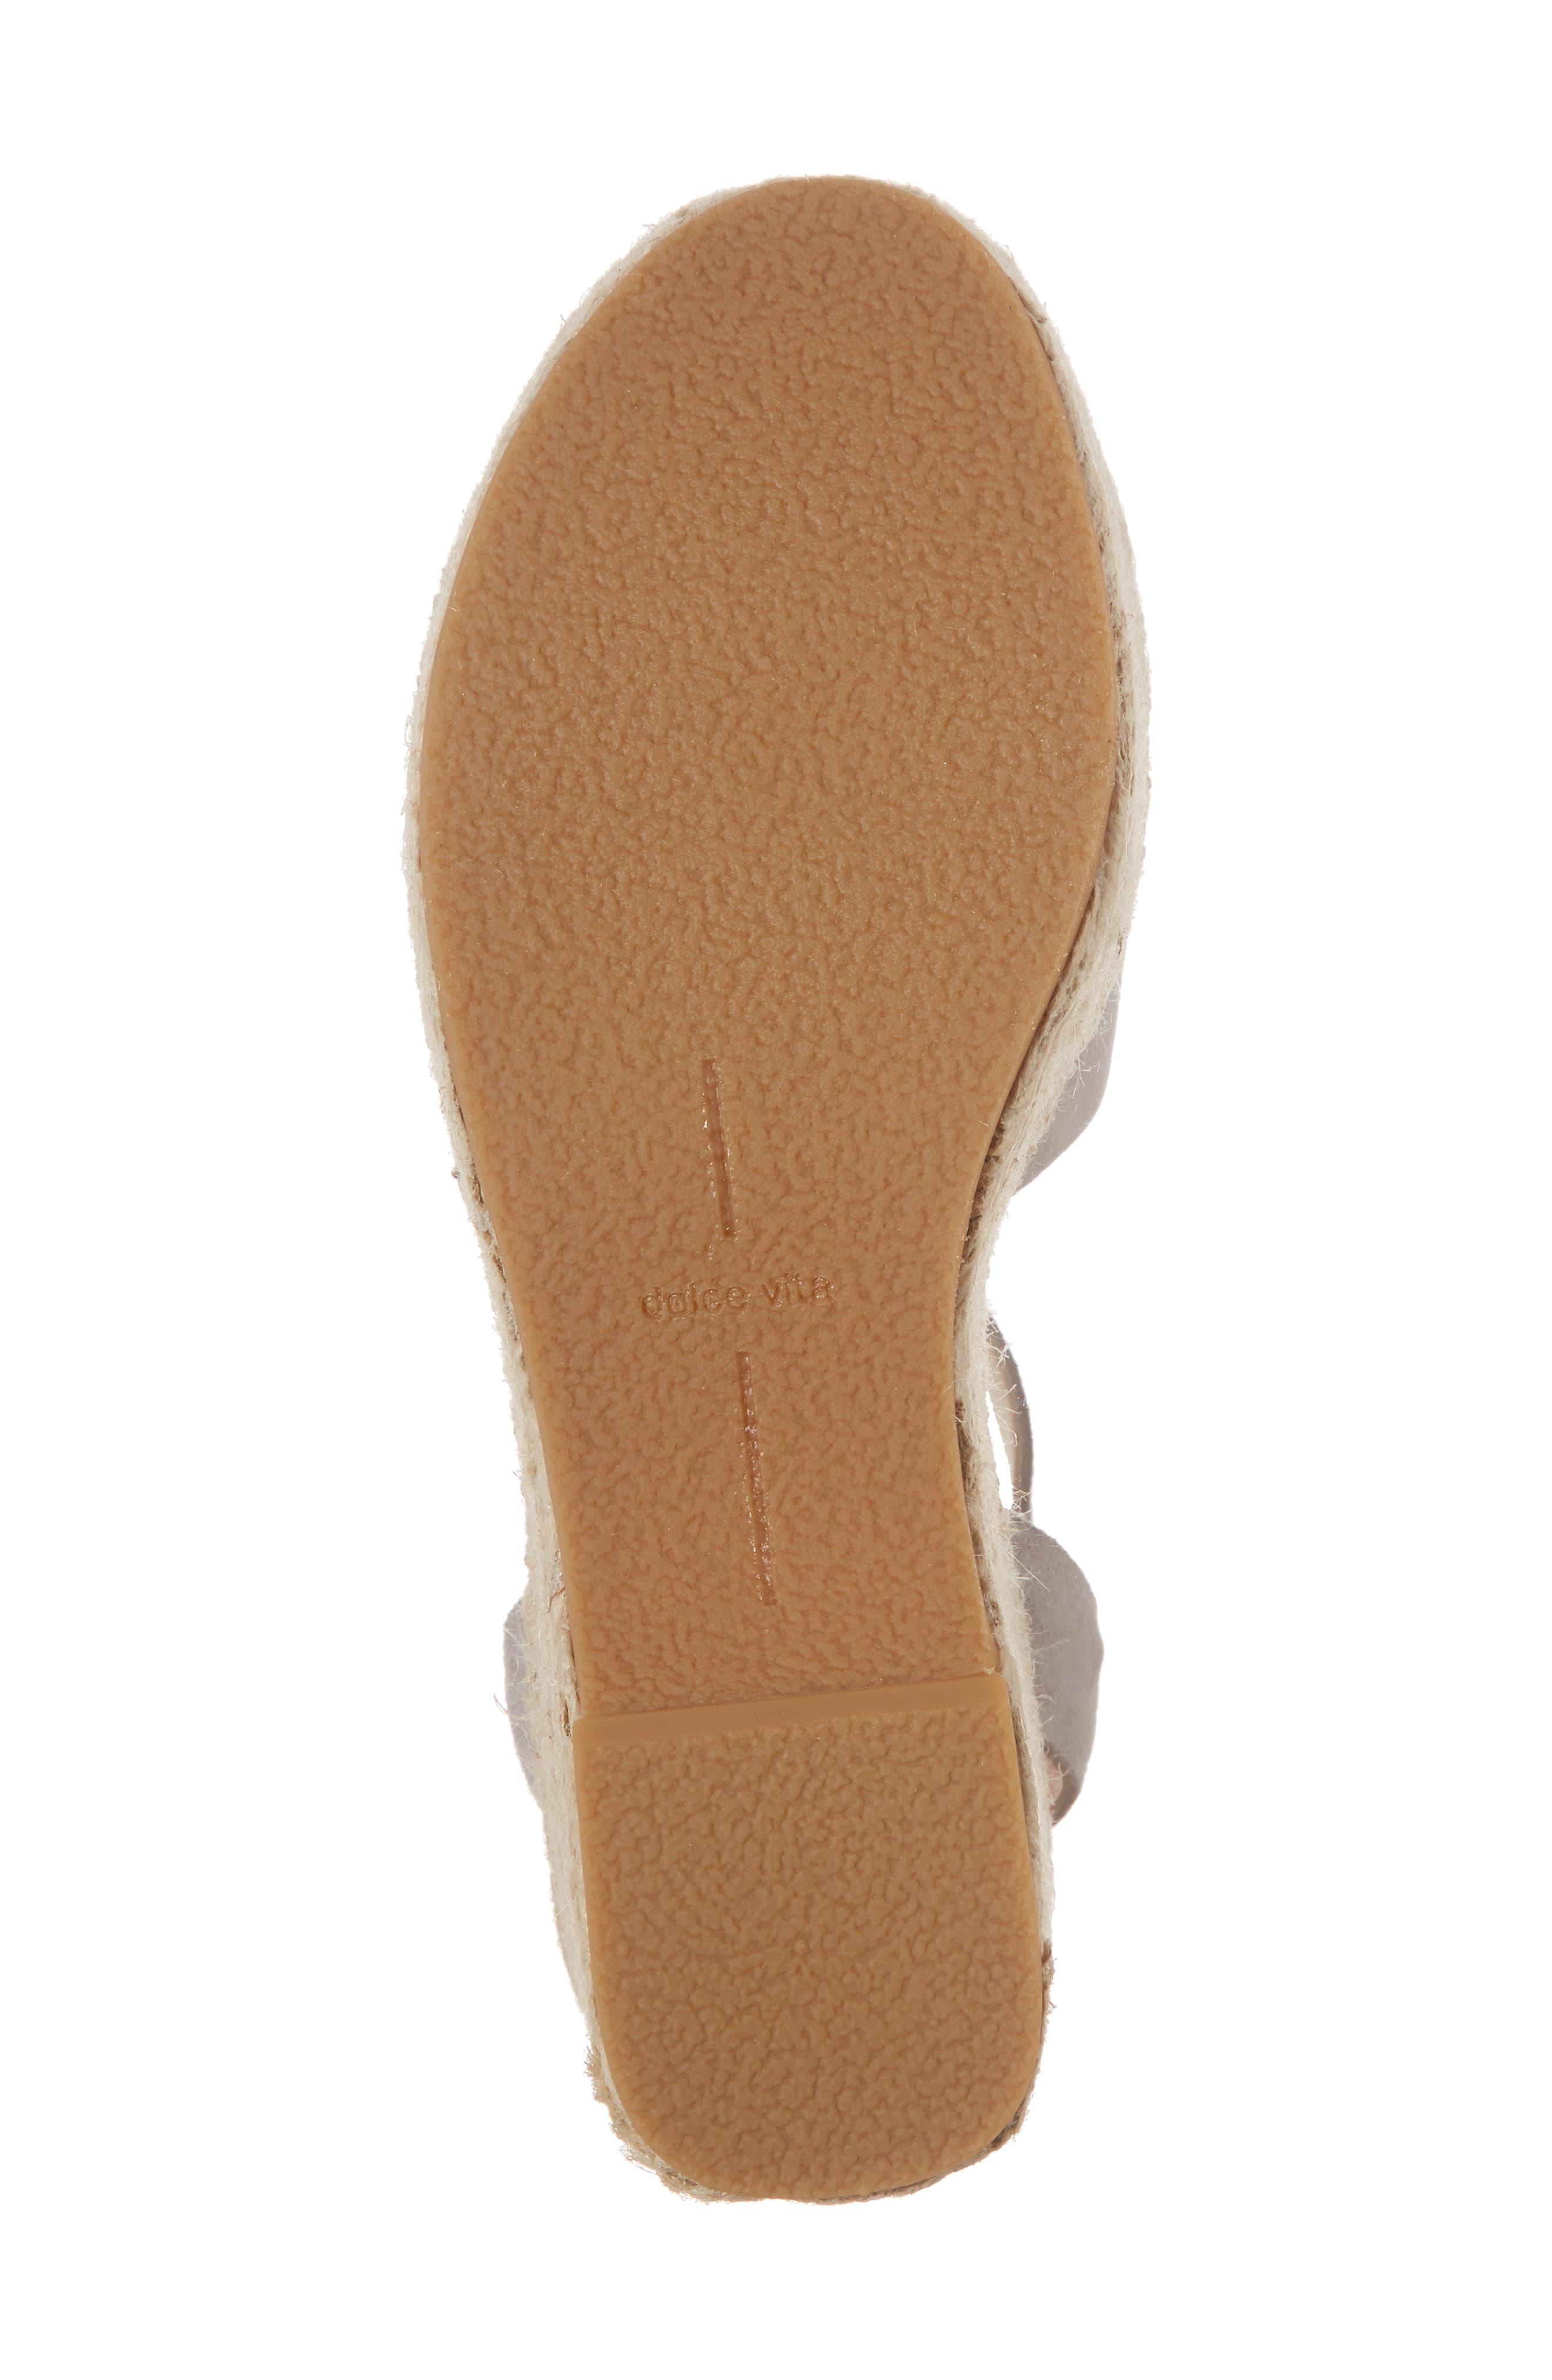 Lesly Espadrille Platform Sandal,                             Alternate thumbnail 38, color,